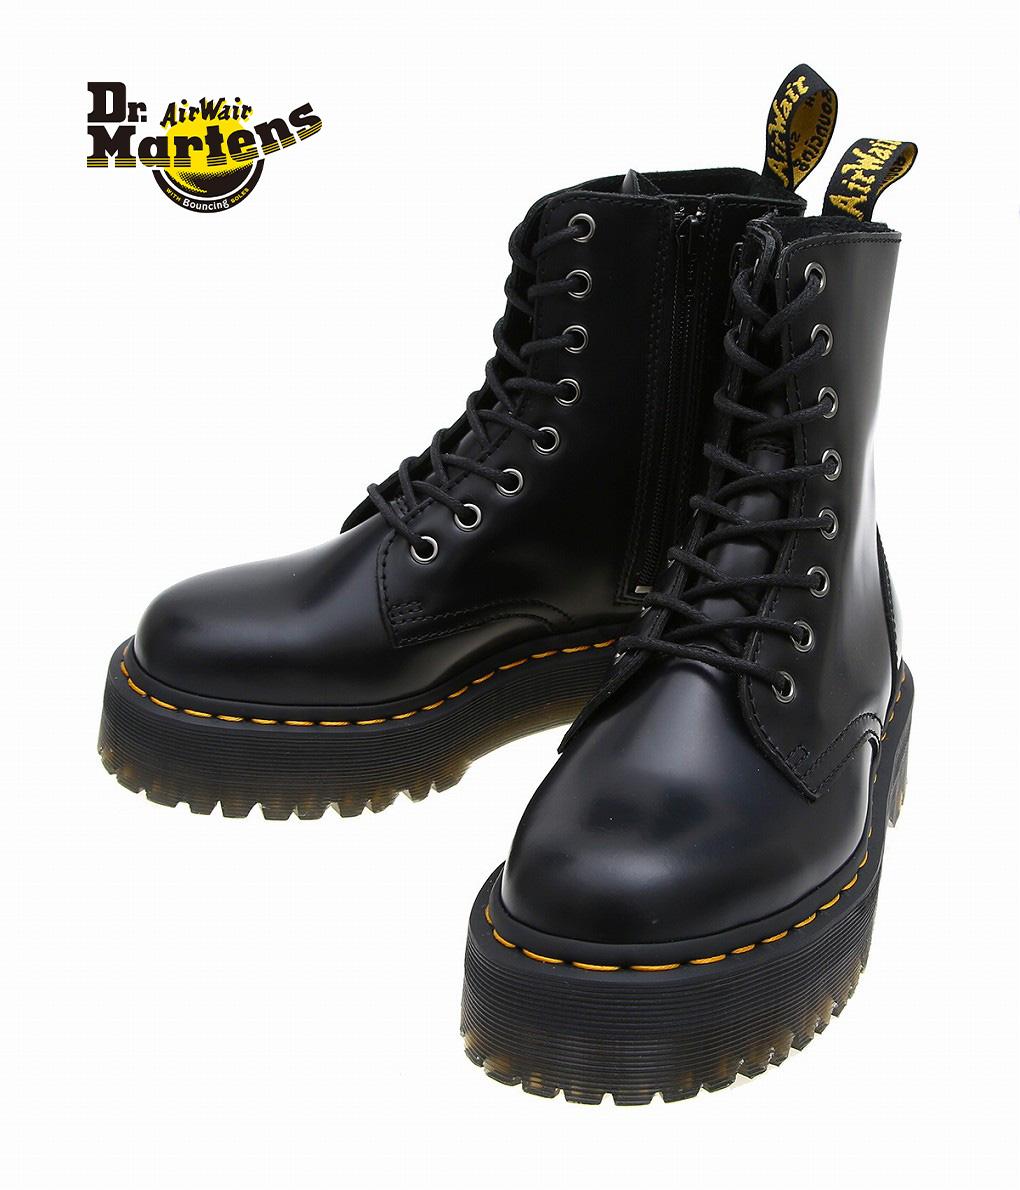 Dr.Martens / ドクターマーチン : JADON : ジェードン シューズ ドクターマーチン 靴 ブーツ : 15265001 【DEA】